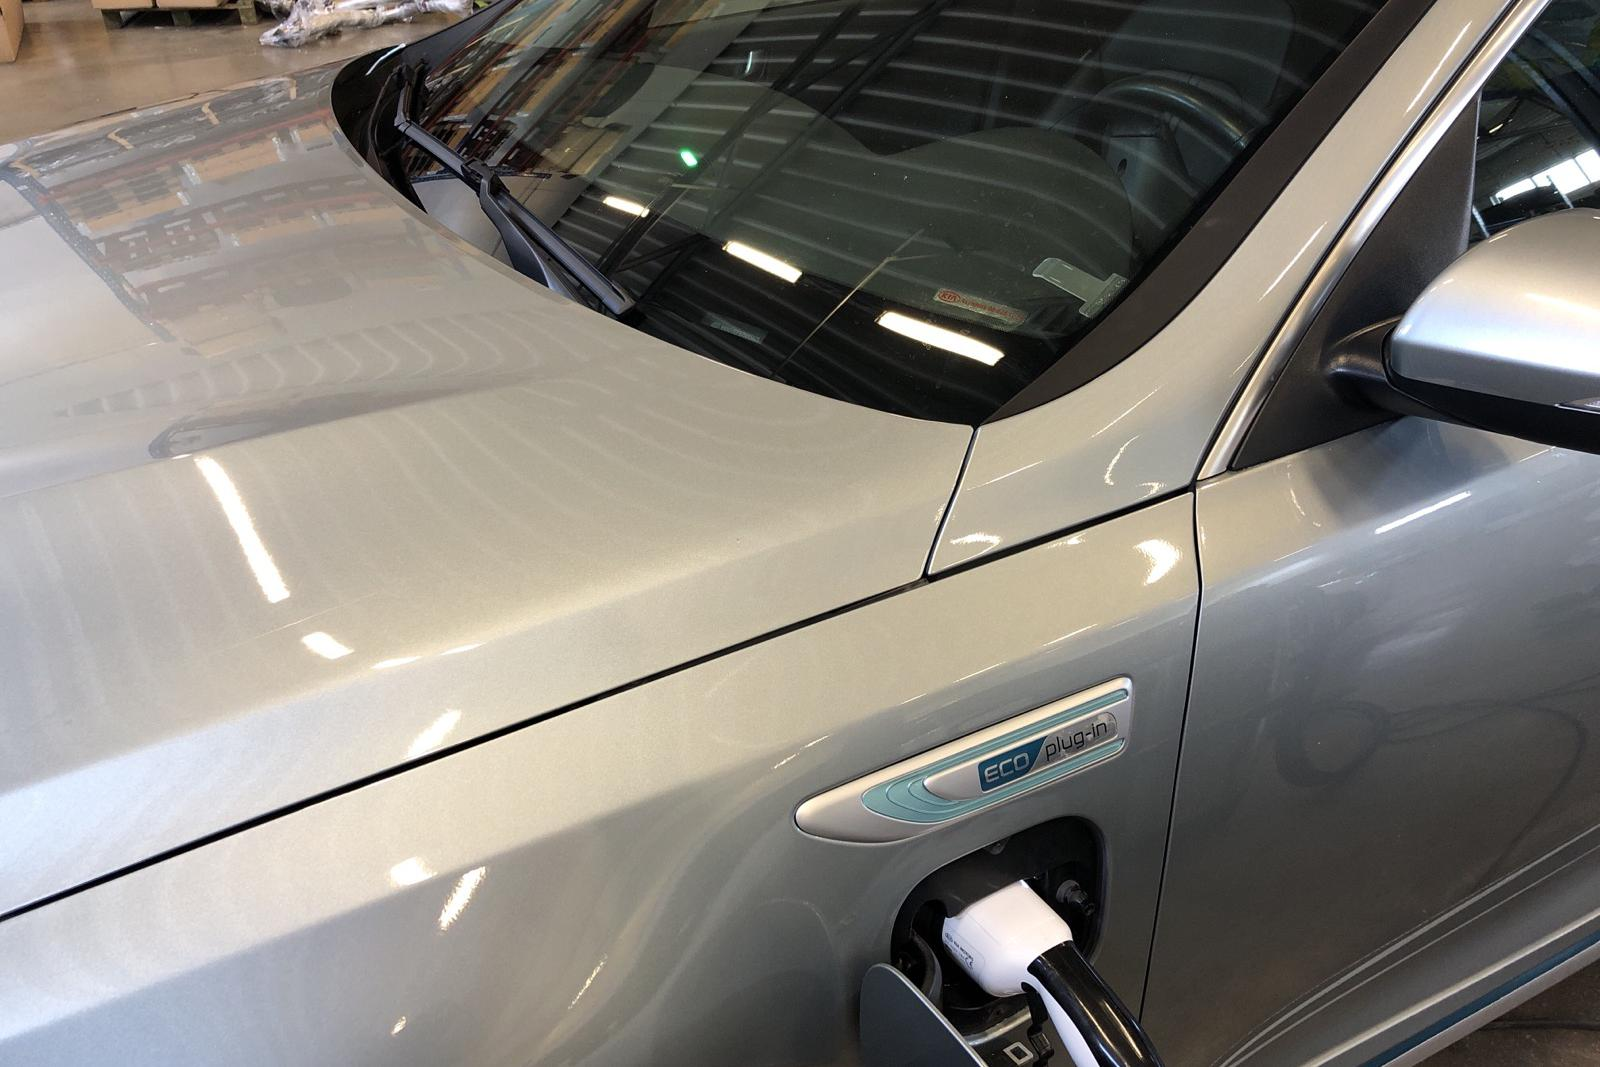 KIA Optima 2.0 GDi Plug-in Hybrid SW (205hk) - 71 840 km - Automatic - gray - 2018